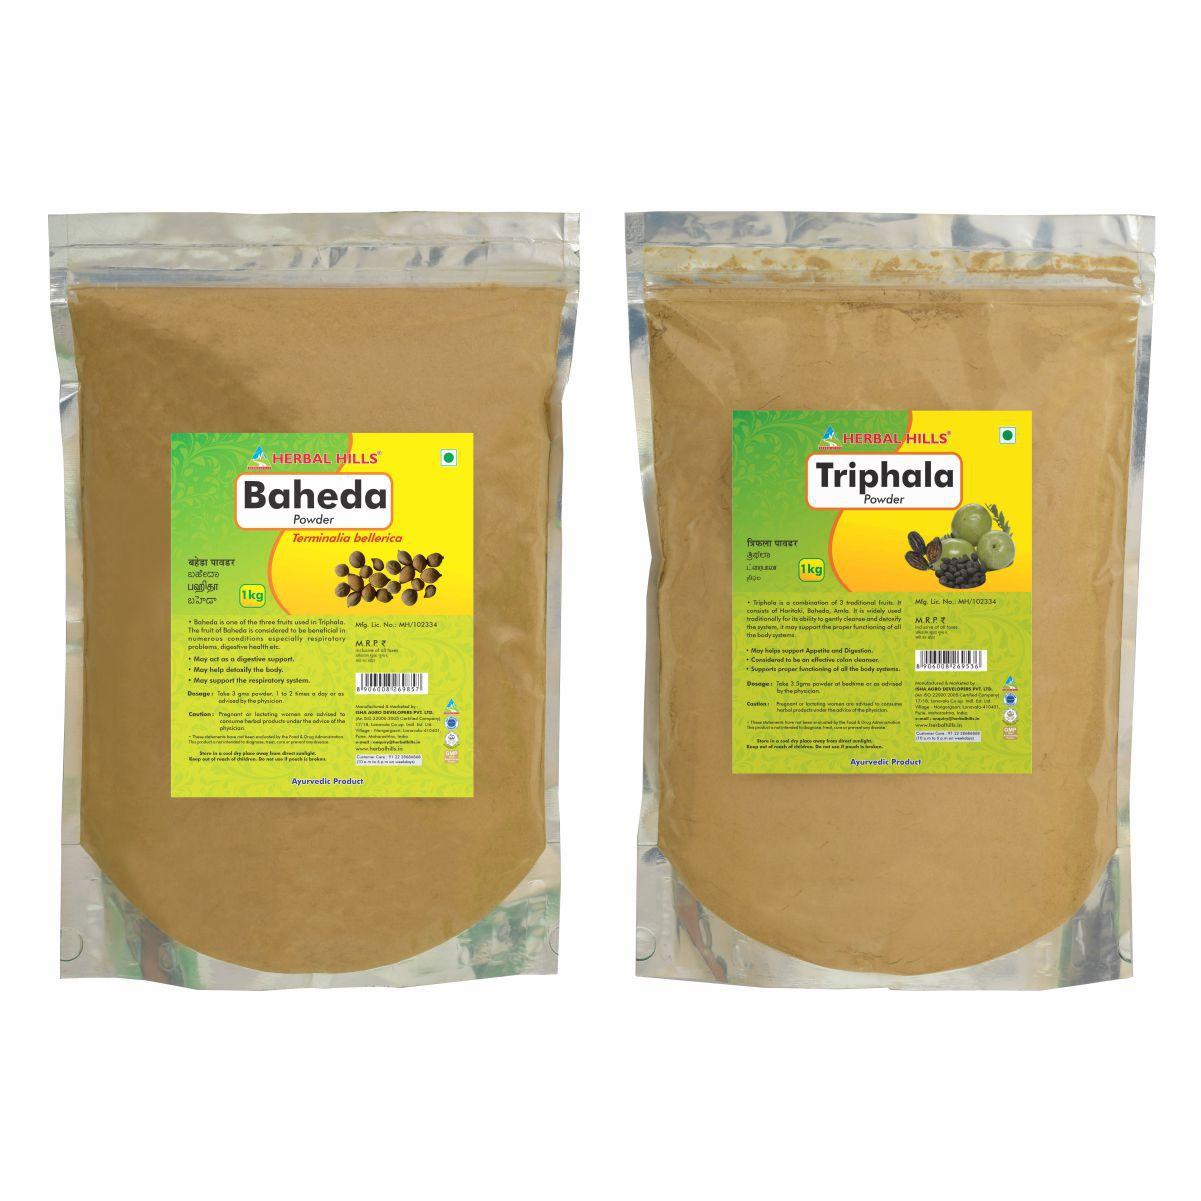 Herbal Hills Baheda and Triphala Powder 1 kg Pack Of 2